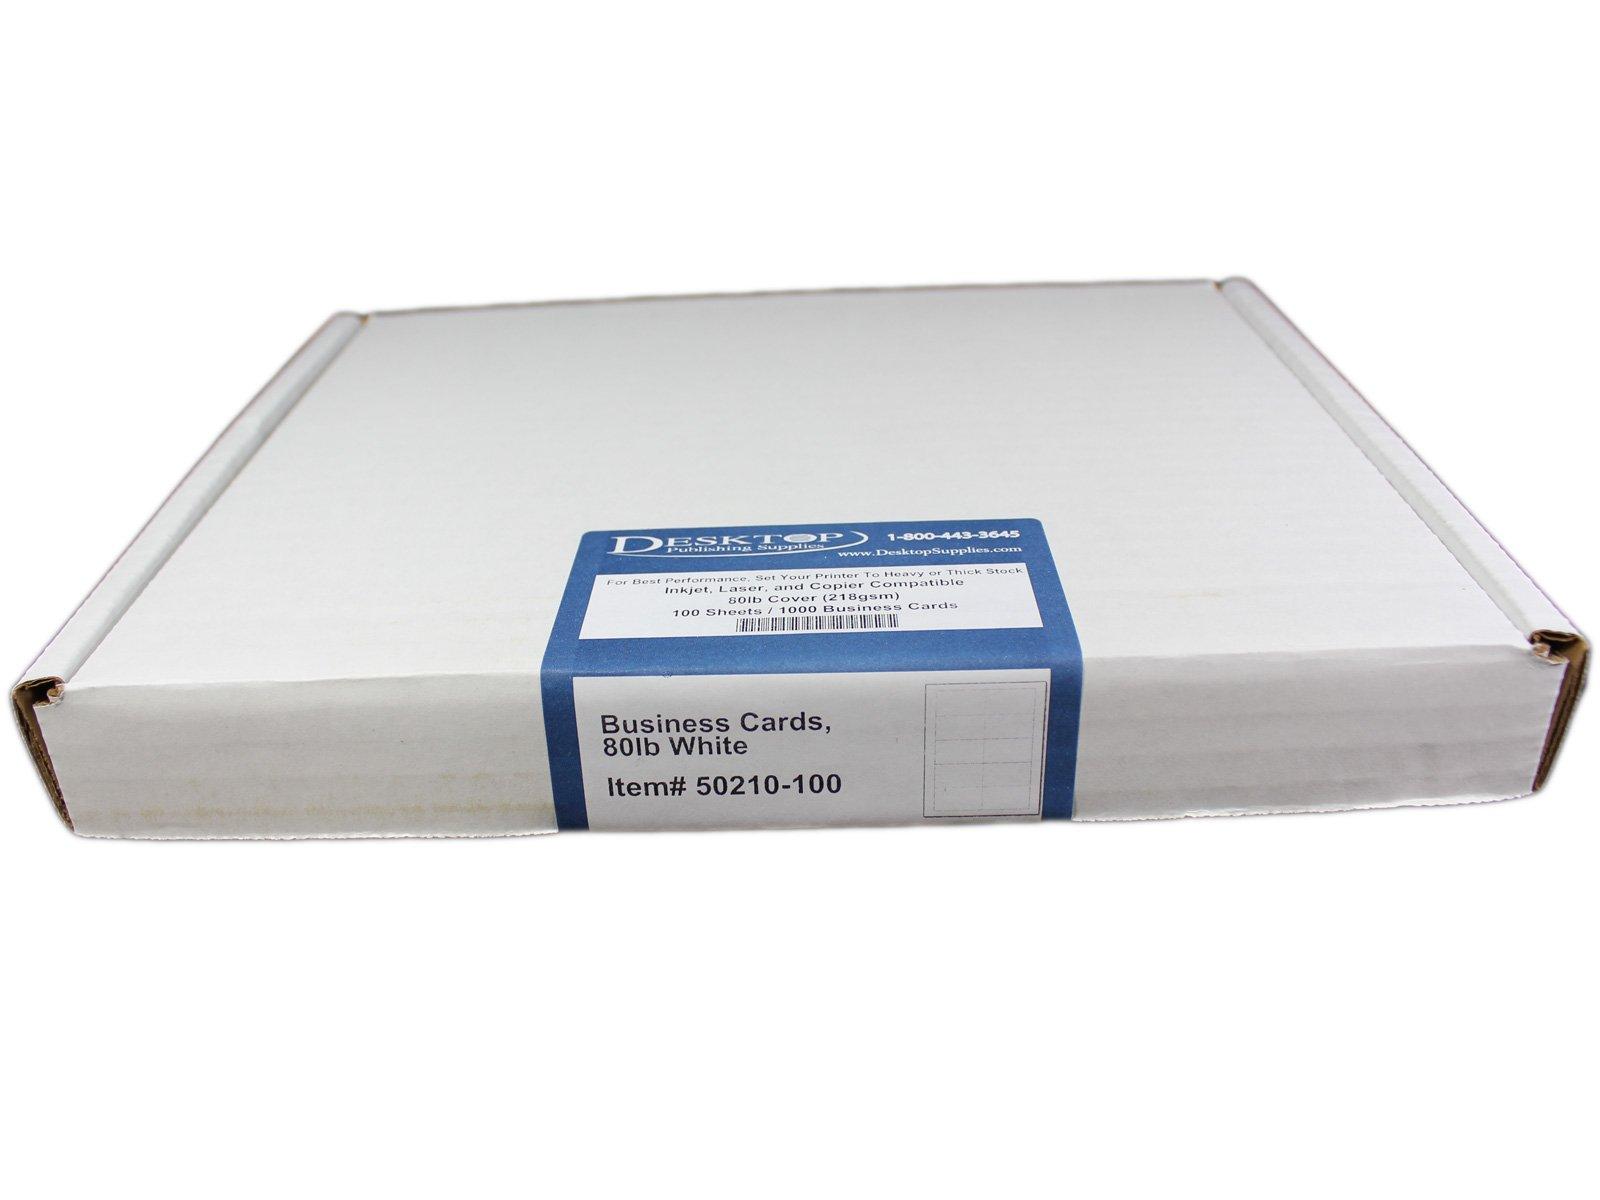 80lb White Blank Business Cards - 100 Sheets / 1000 Business Cards - Inkjet & Laser